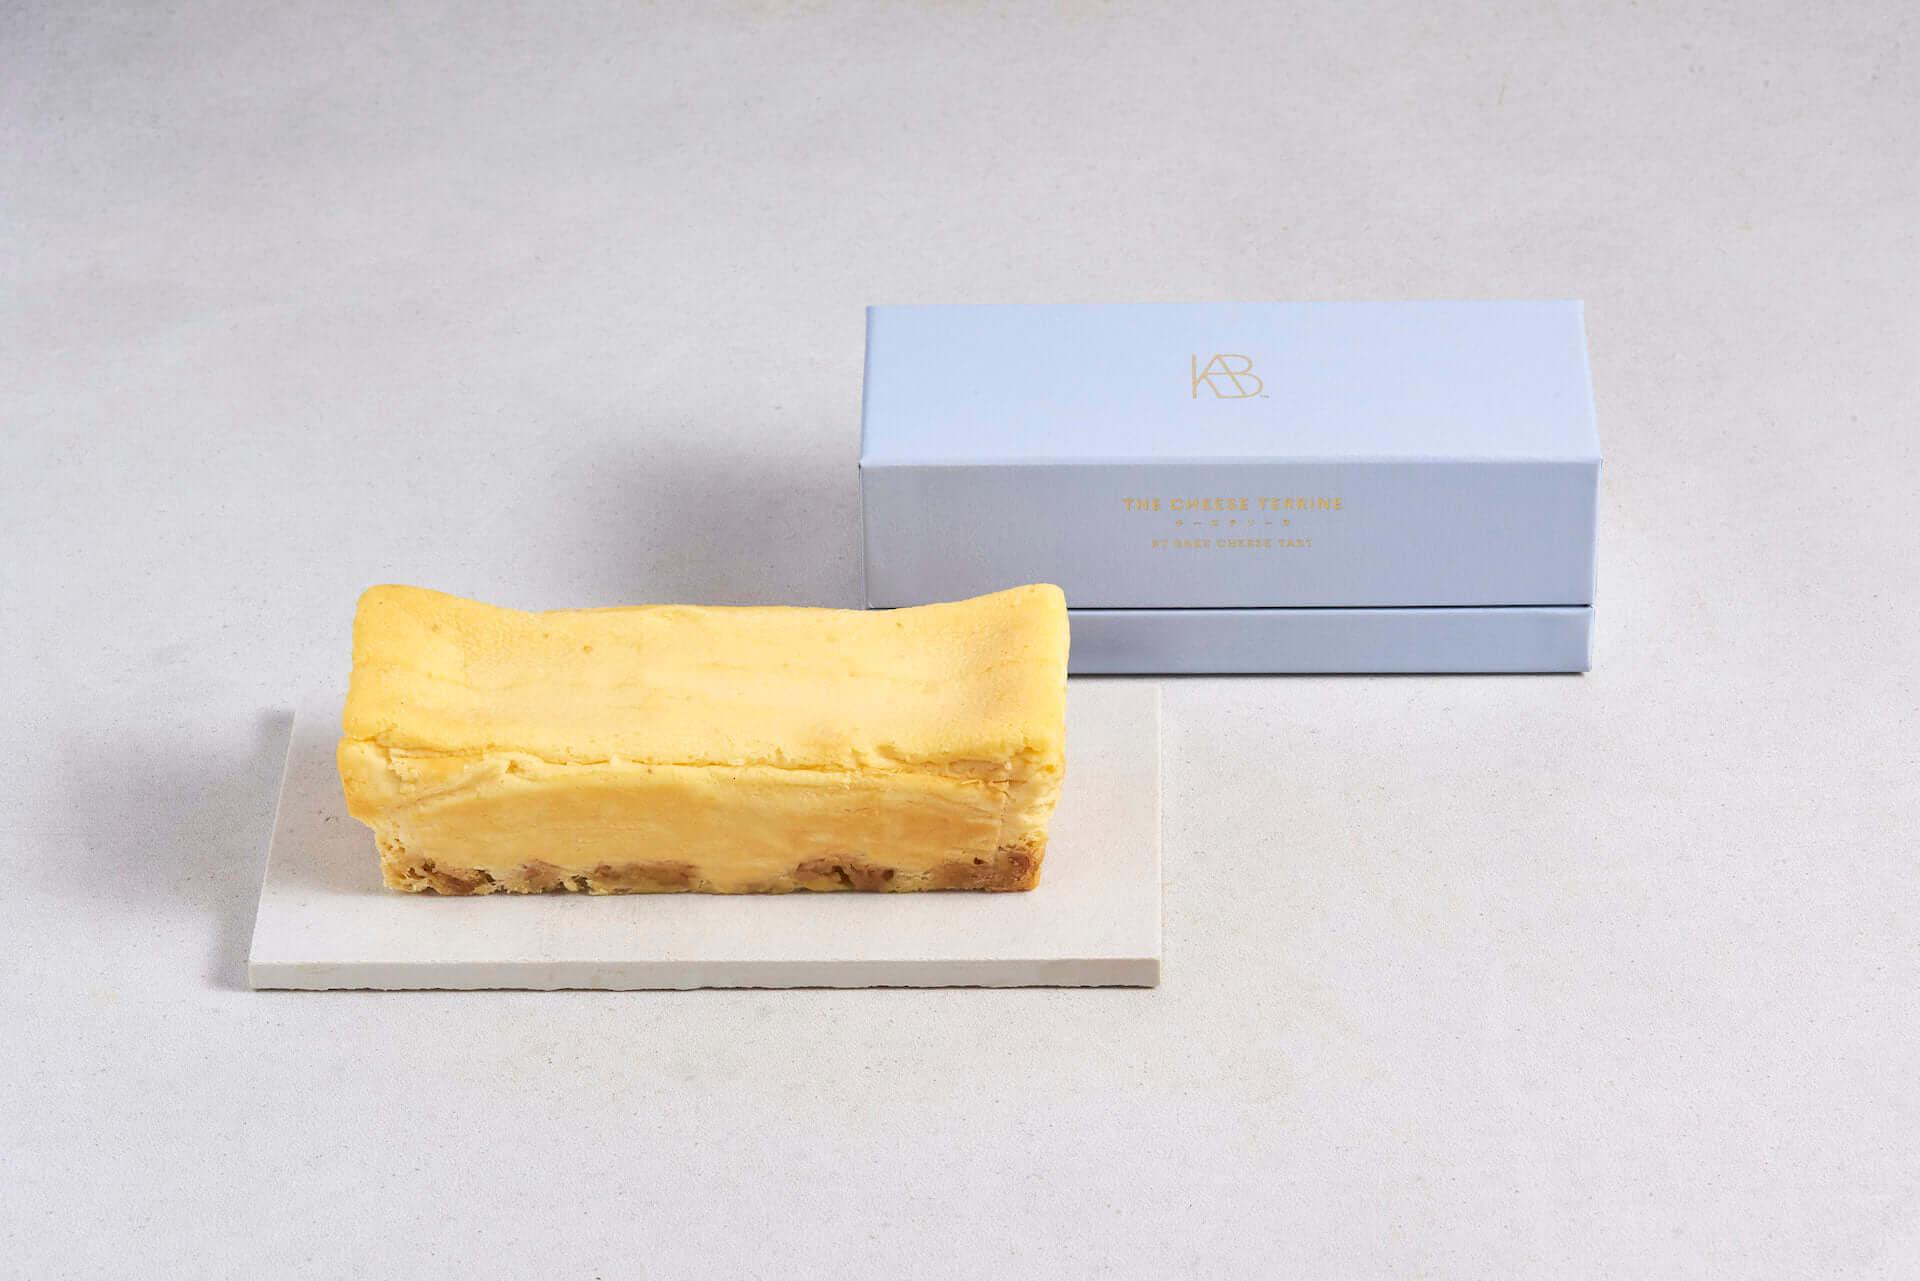 BAKEが濃厚なチーズテリーヌ主軸の新ブランド「THE CHEESE TERRINE by BAKE CHEESE TART」をローンチ!数量限定で予約受付開始 gourmet201201_bake-cheese-tart_2-1920x1281